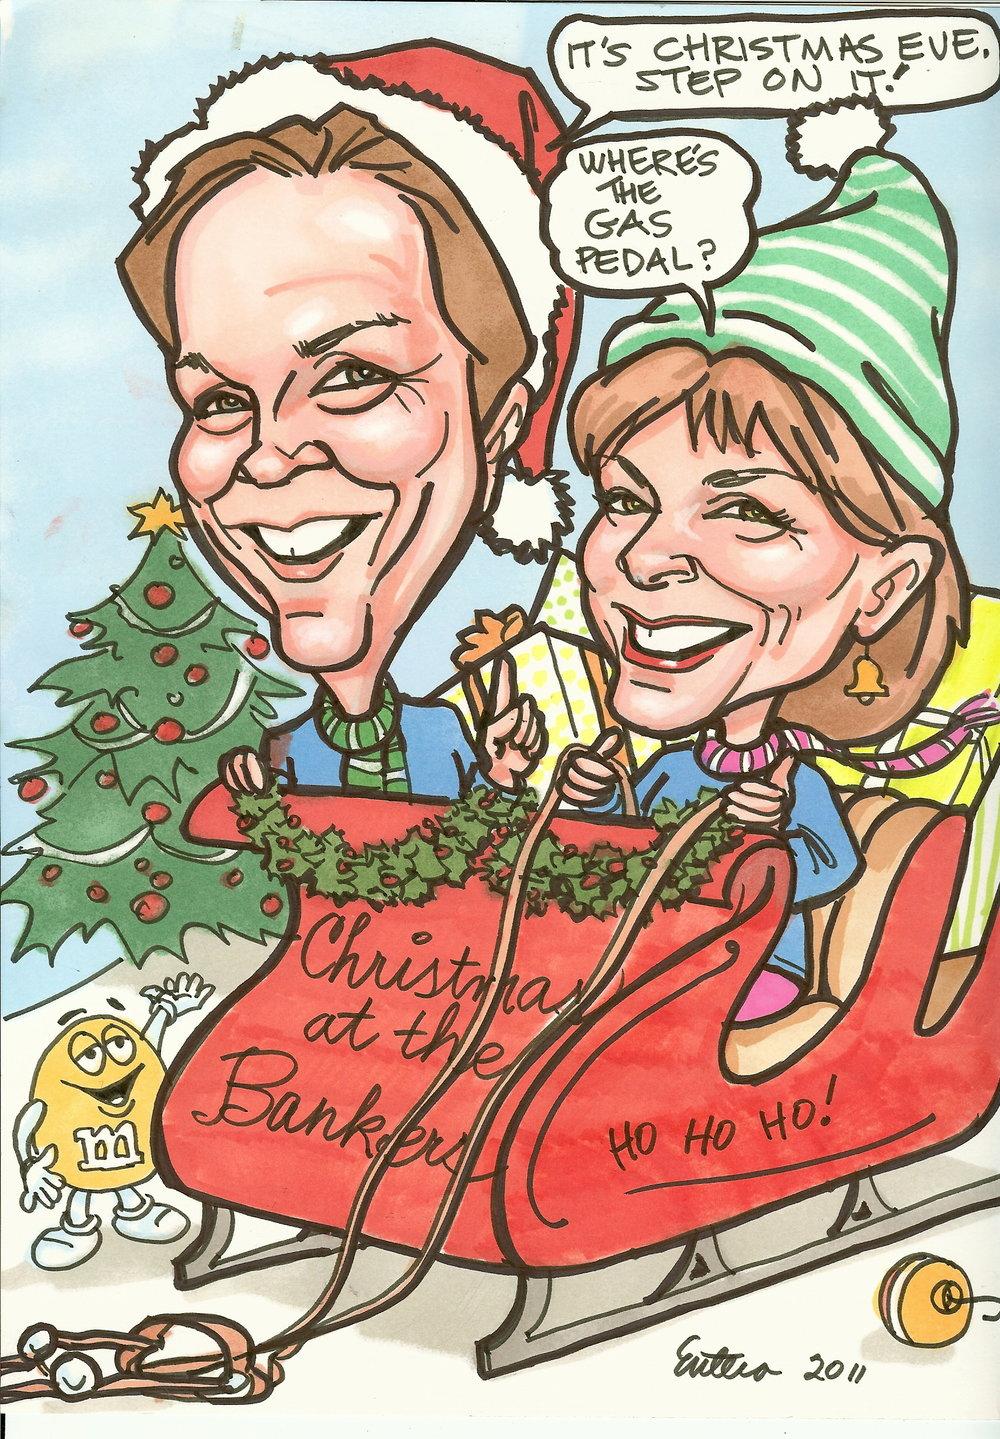 Bankers Christmas 2011.jpg